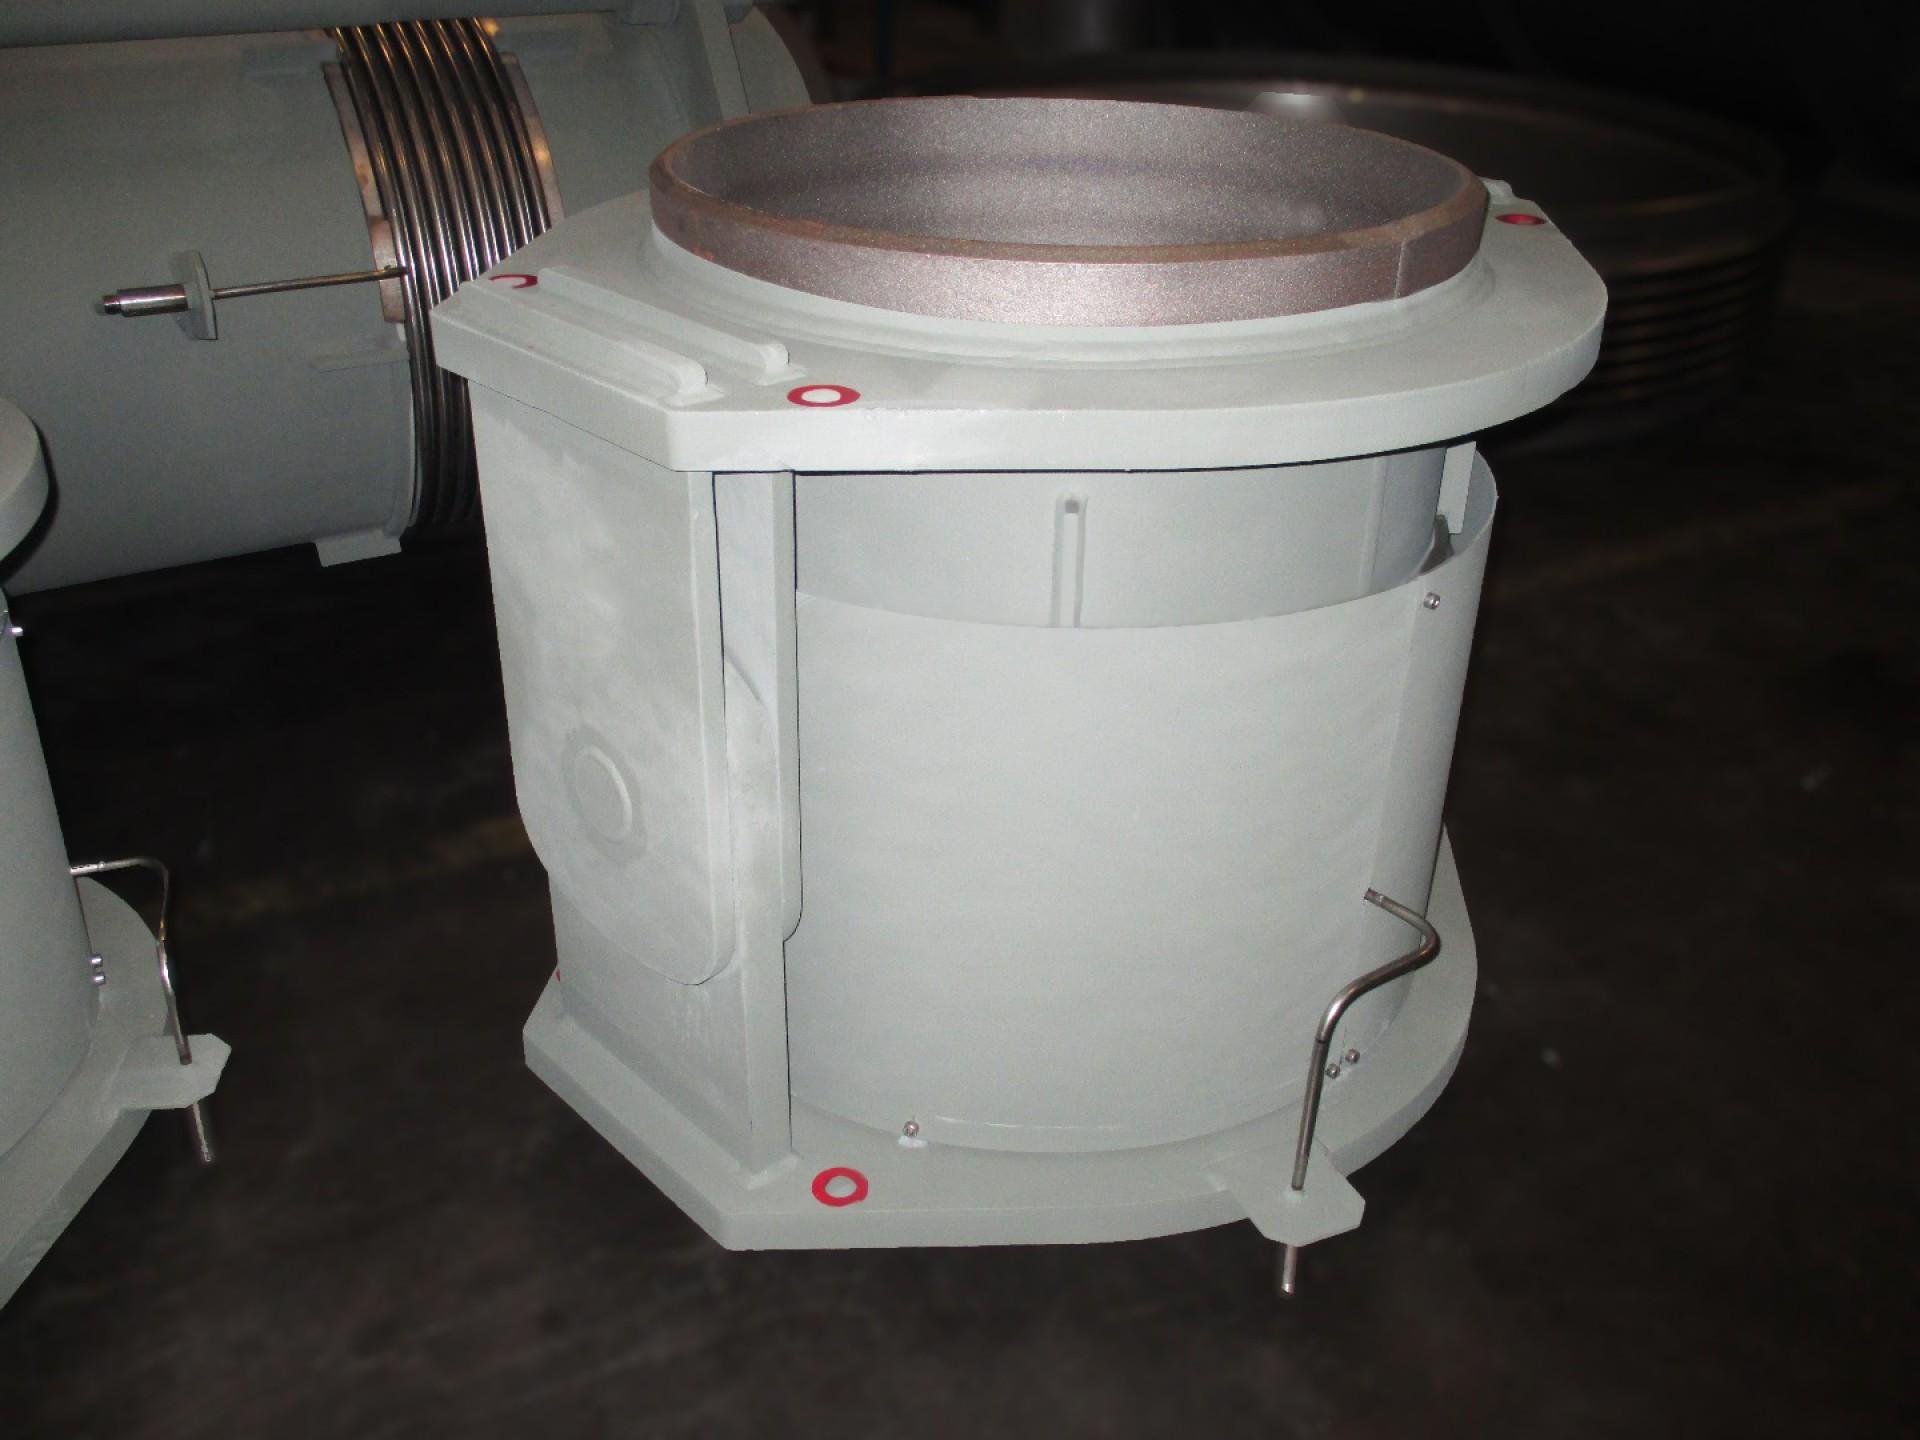 Junta con fuelles monitorizables de dos láminas